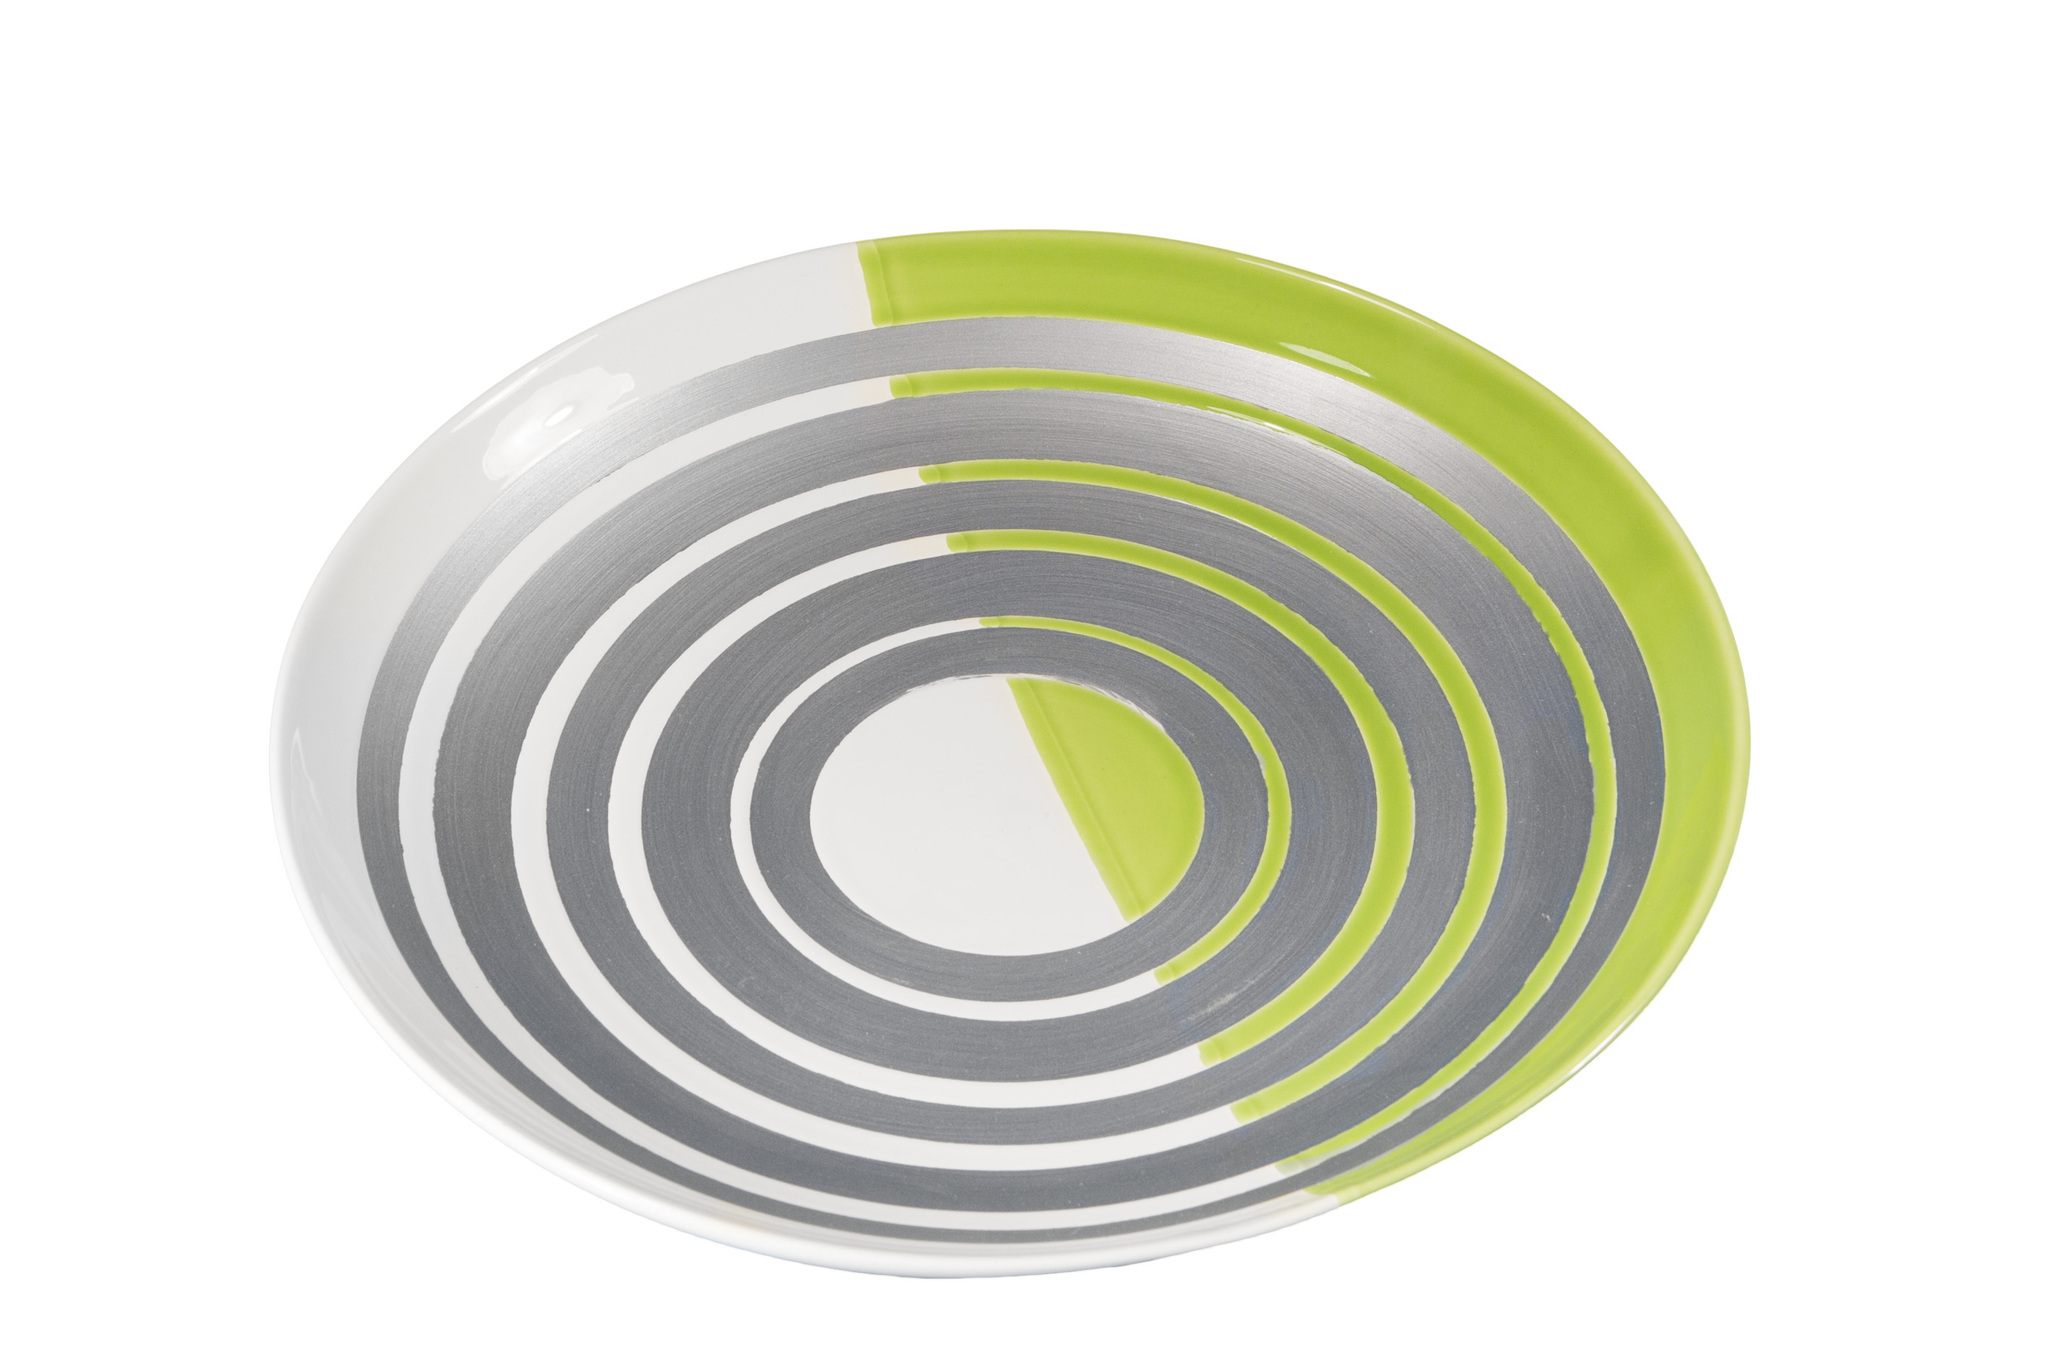 Блюда и тарелки Блюдо декоративное Тавира от Sporvil blyudo-dekorativnoe-tavira-ot-sporvil-iz-portugalii.jpg